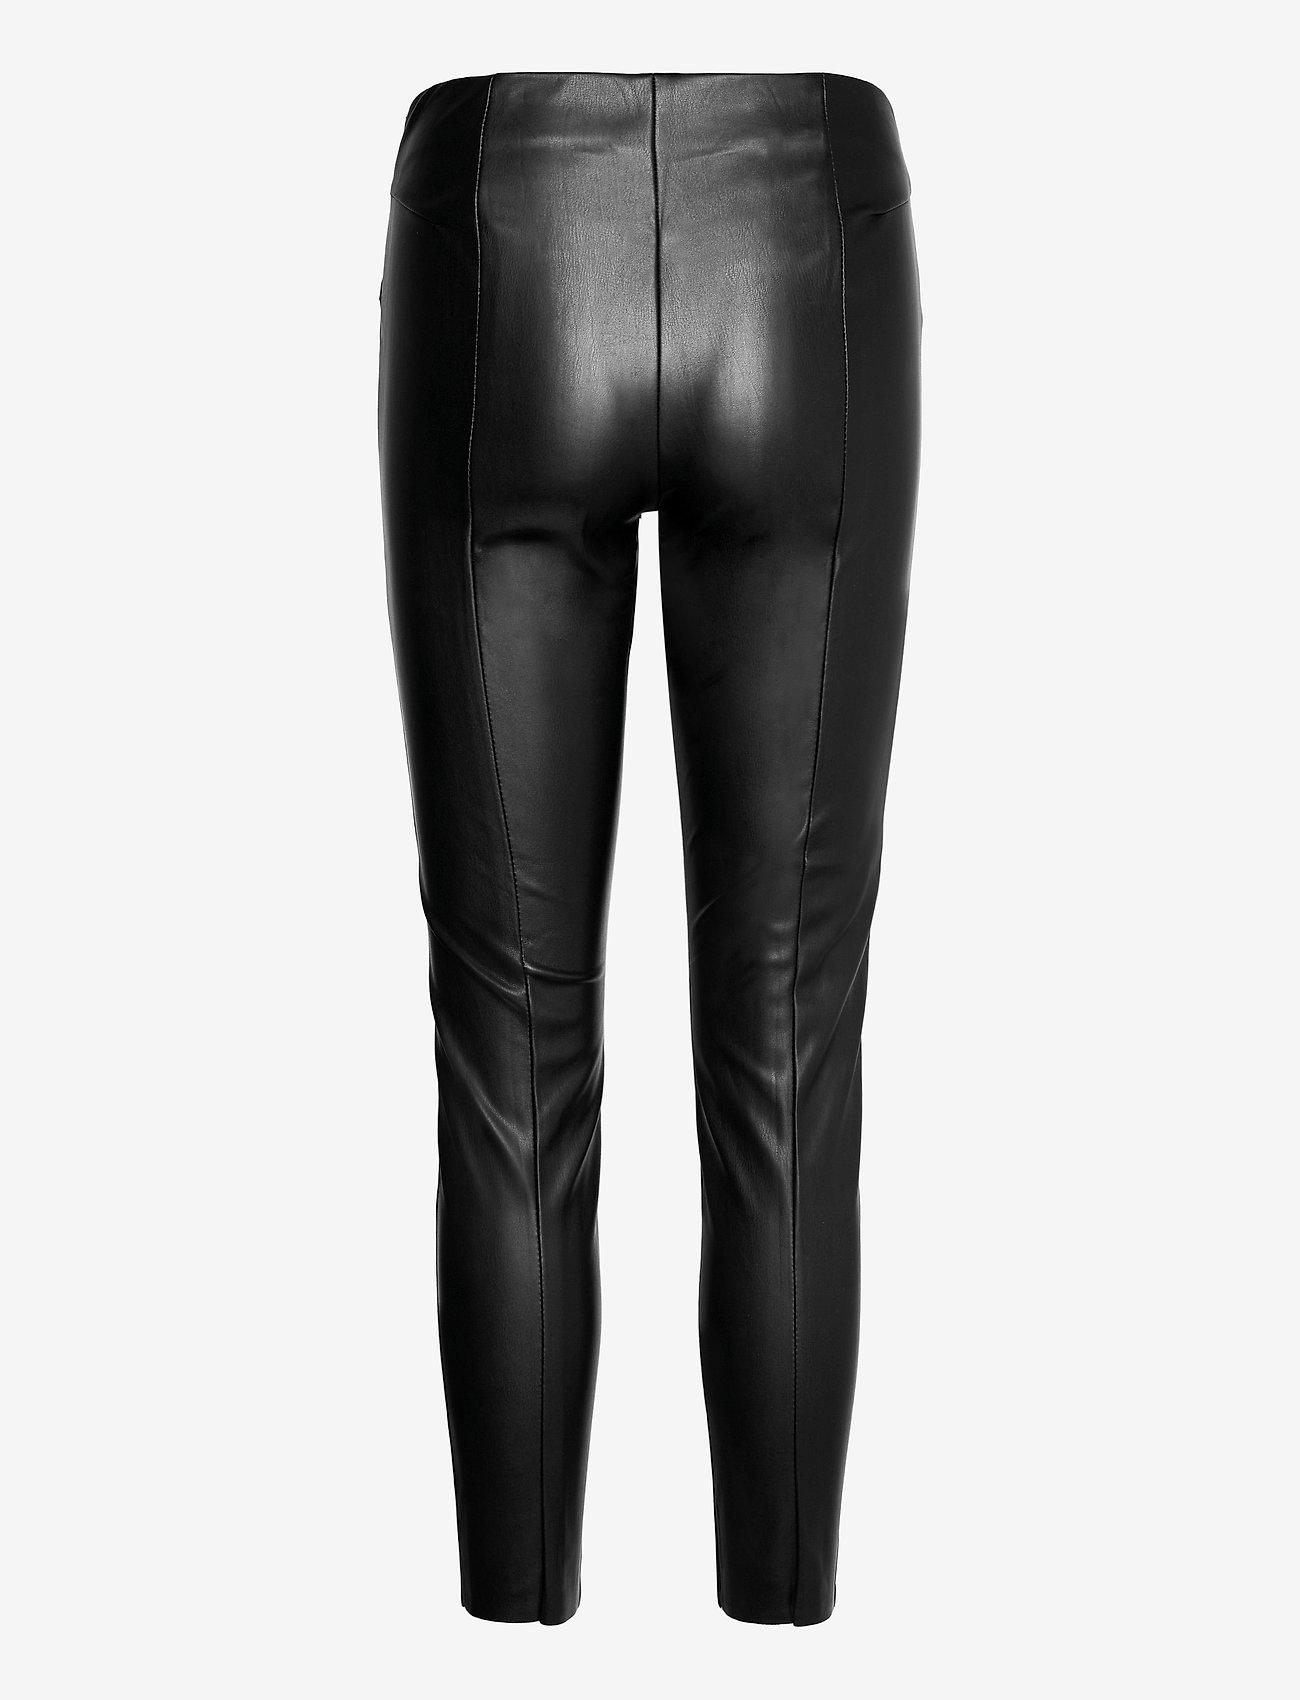 ONLY - ONLJOLEE FAUX LEAHTER CUT LEGGING PNT - læderbukser - black - 1